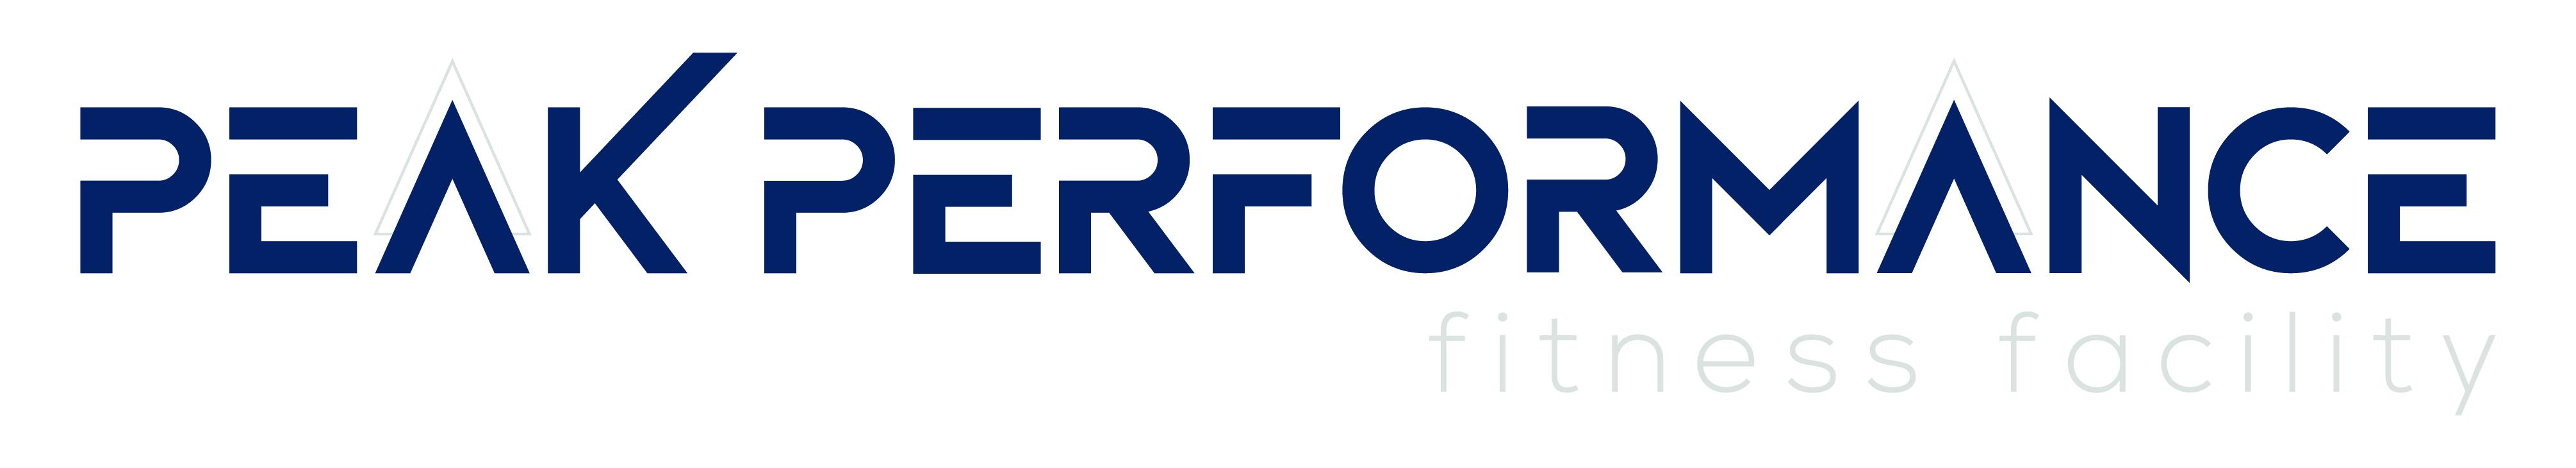 Peak Performance Fitness Facility logo